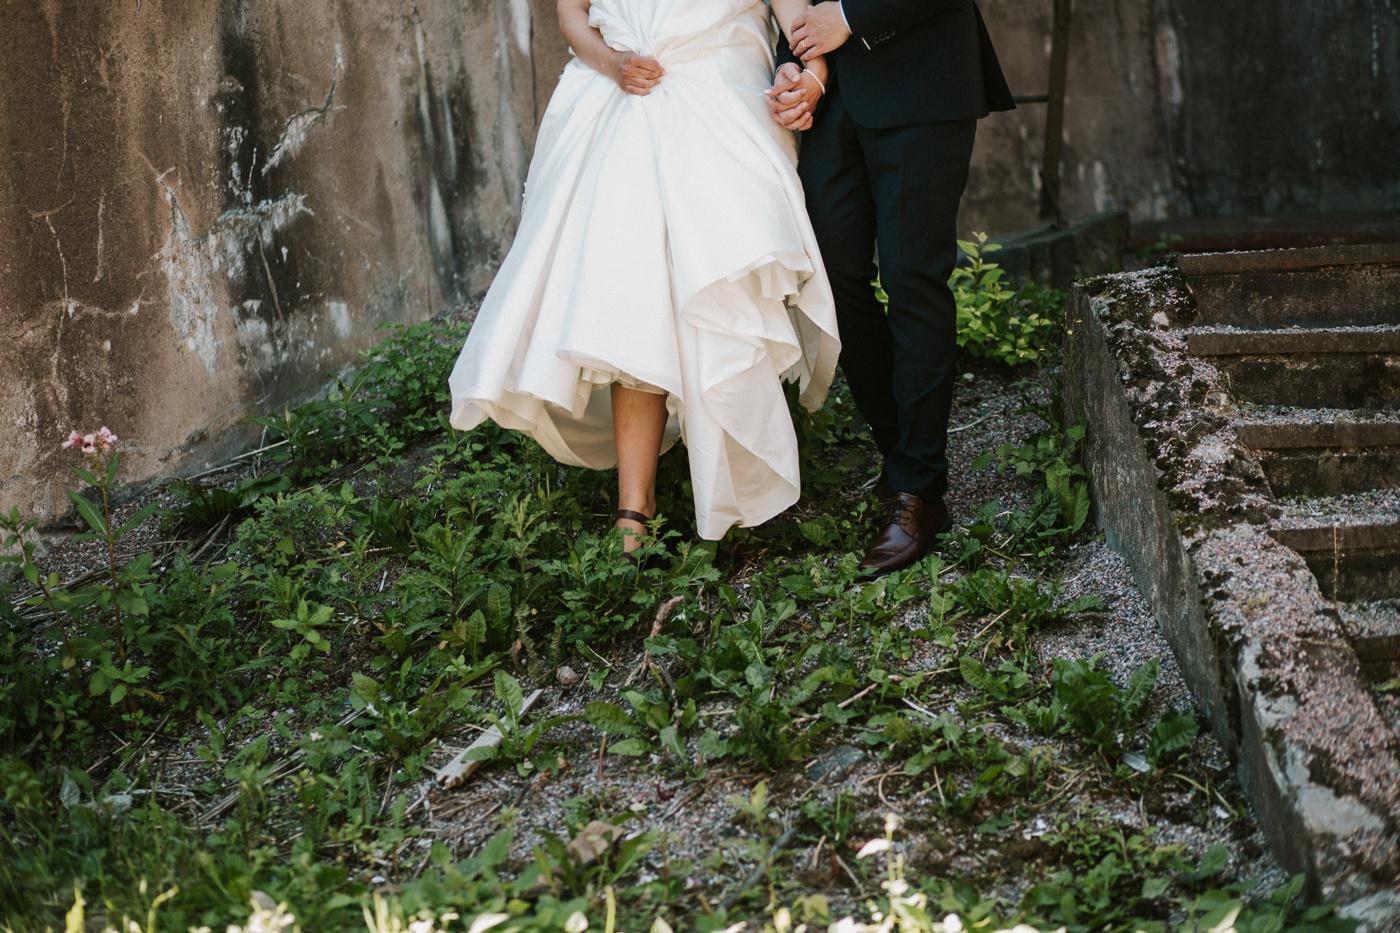 ceciliajoakim_sweden-countryside-summer-wedding_melbourne-fun-quirky-wedding-photography_44